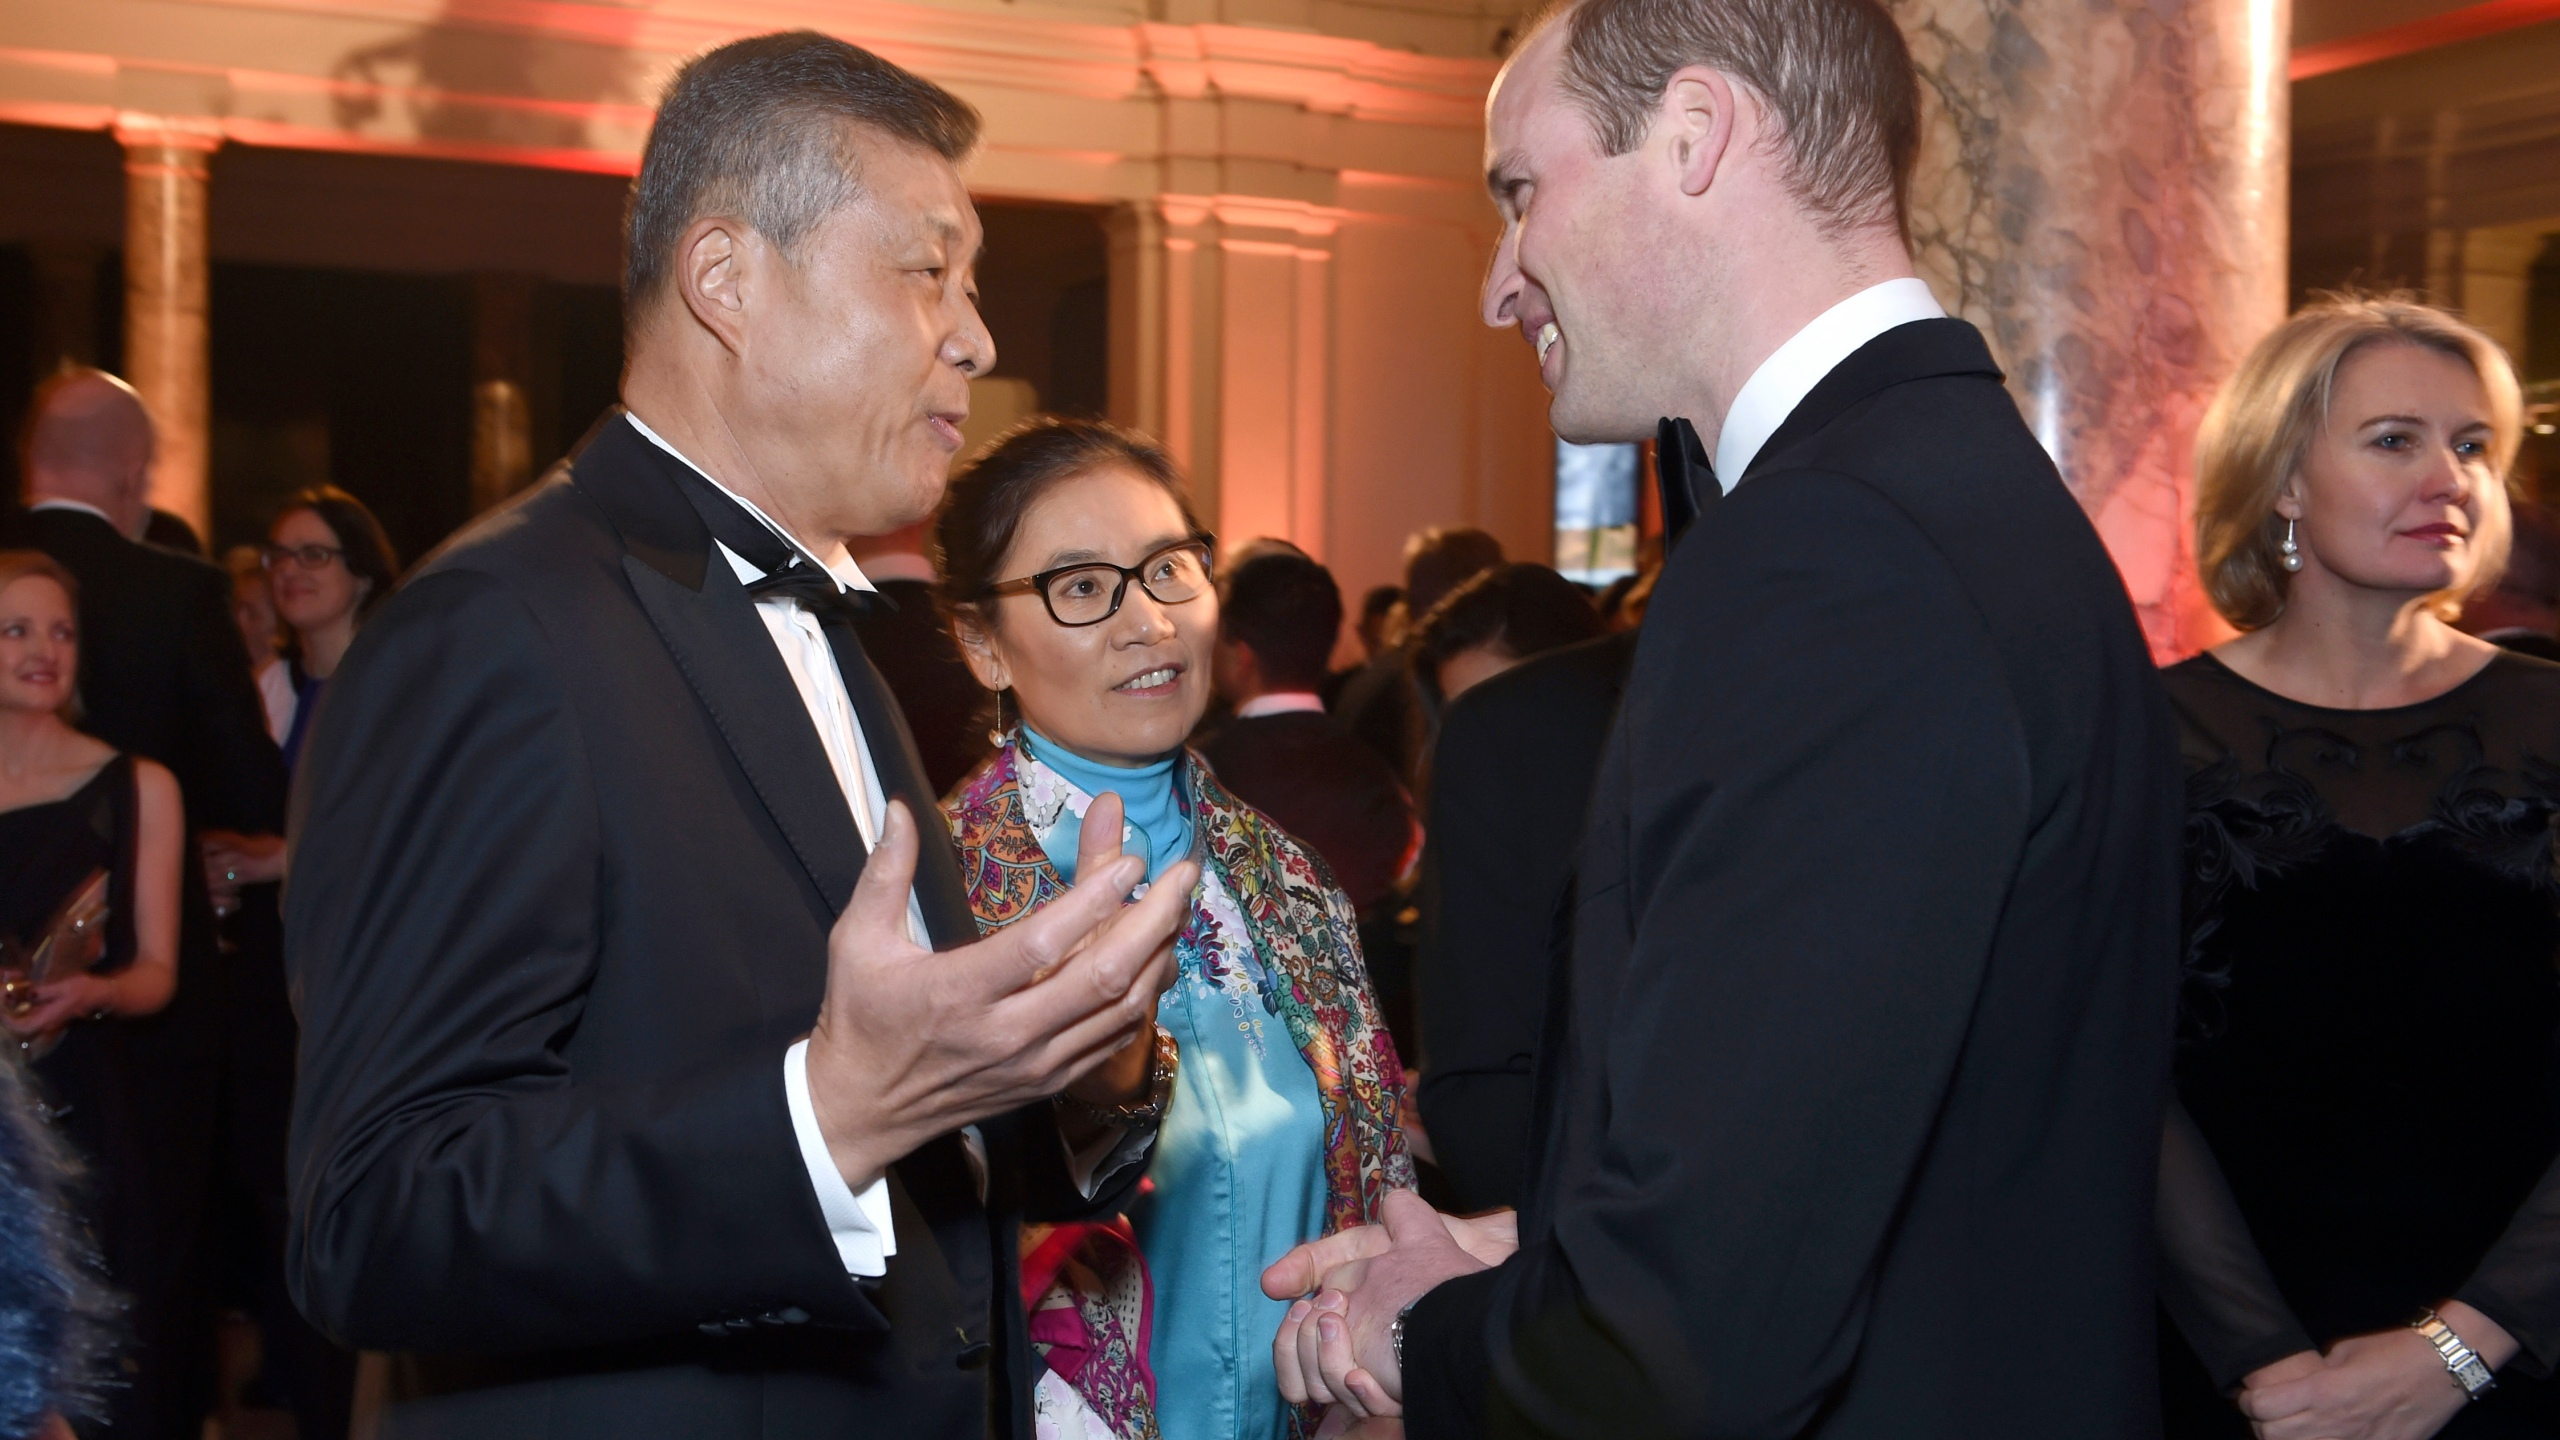 Liu Xiaoming, Prince William